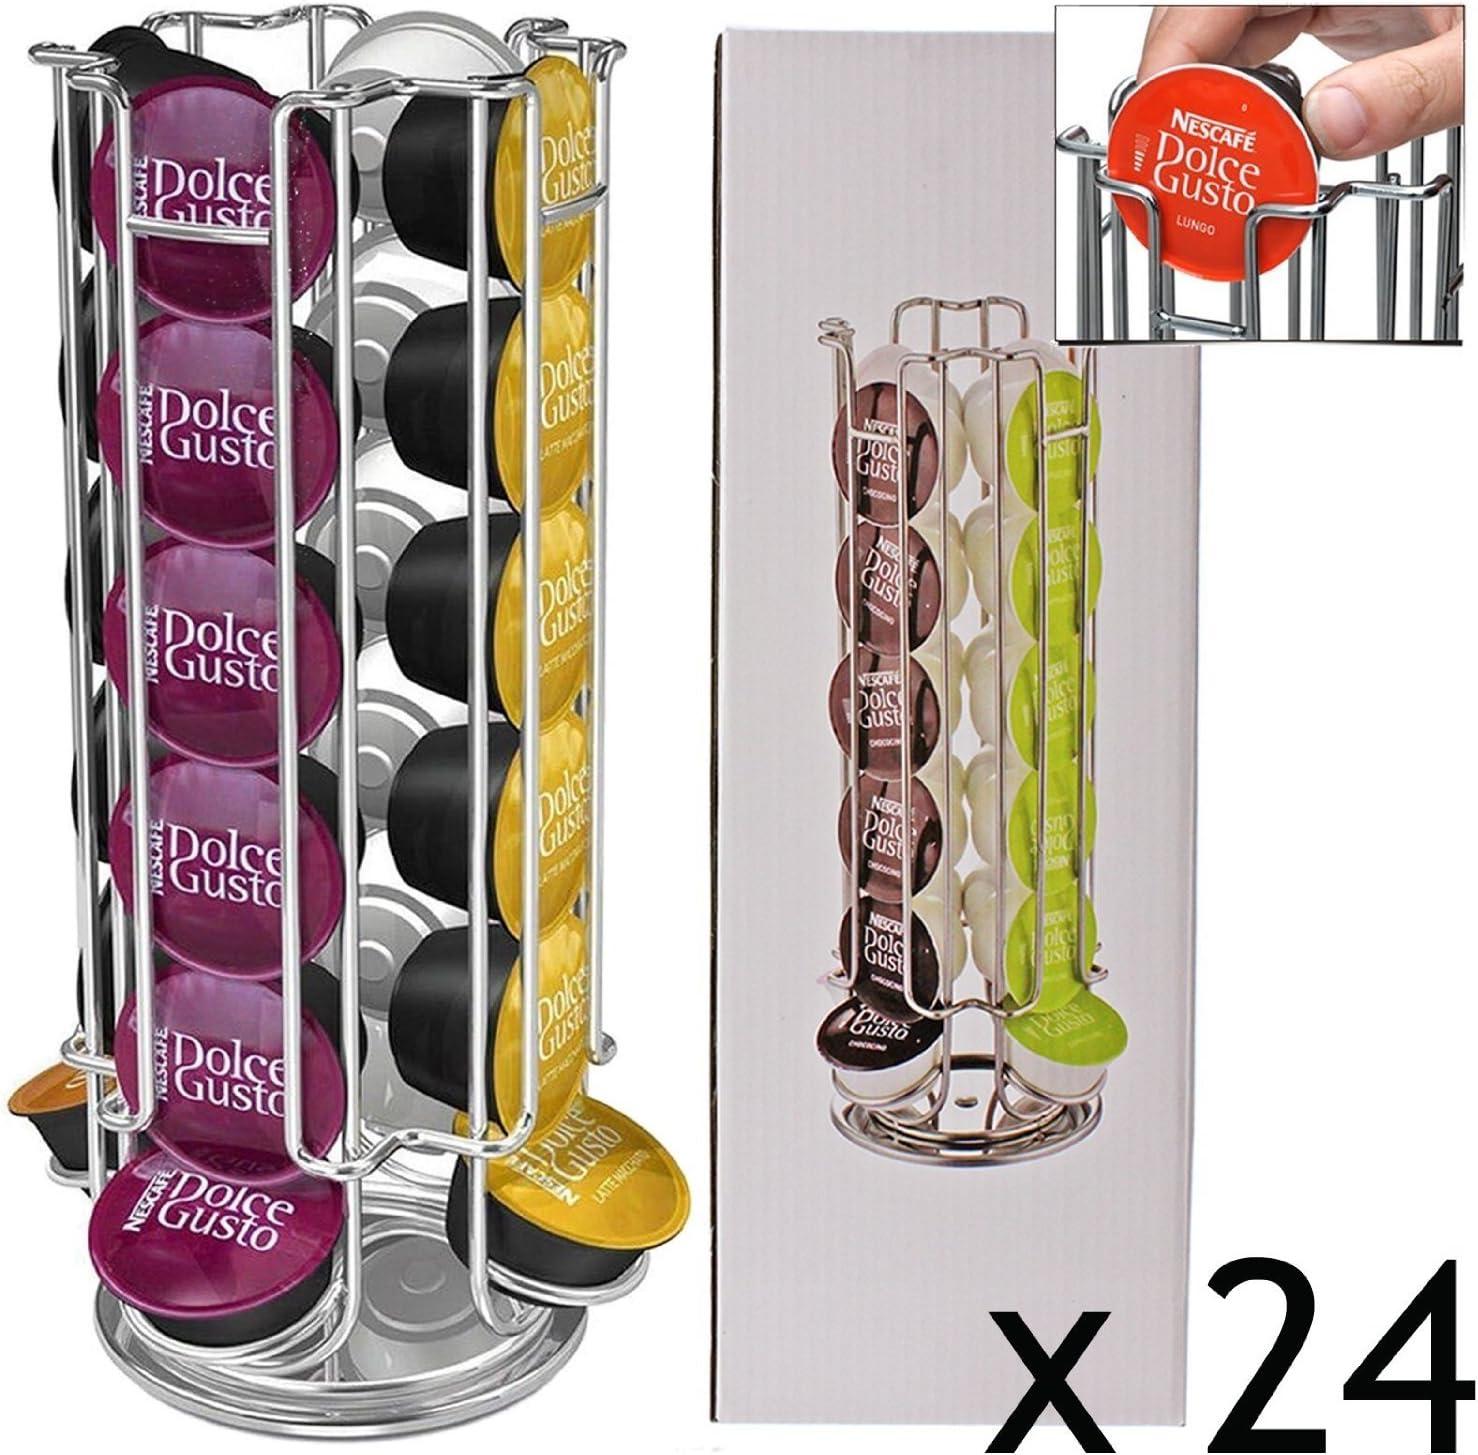 Porte-Capsules Rotatif Pouvant Contenir 24 Capsules Dolce Gusto Acier Chrom/é by XENBORG